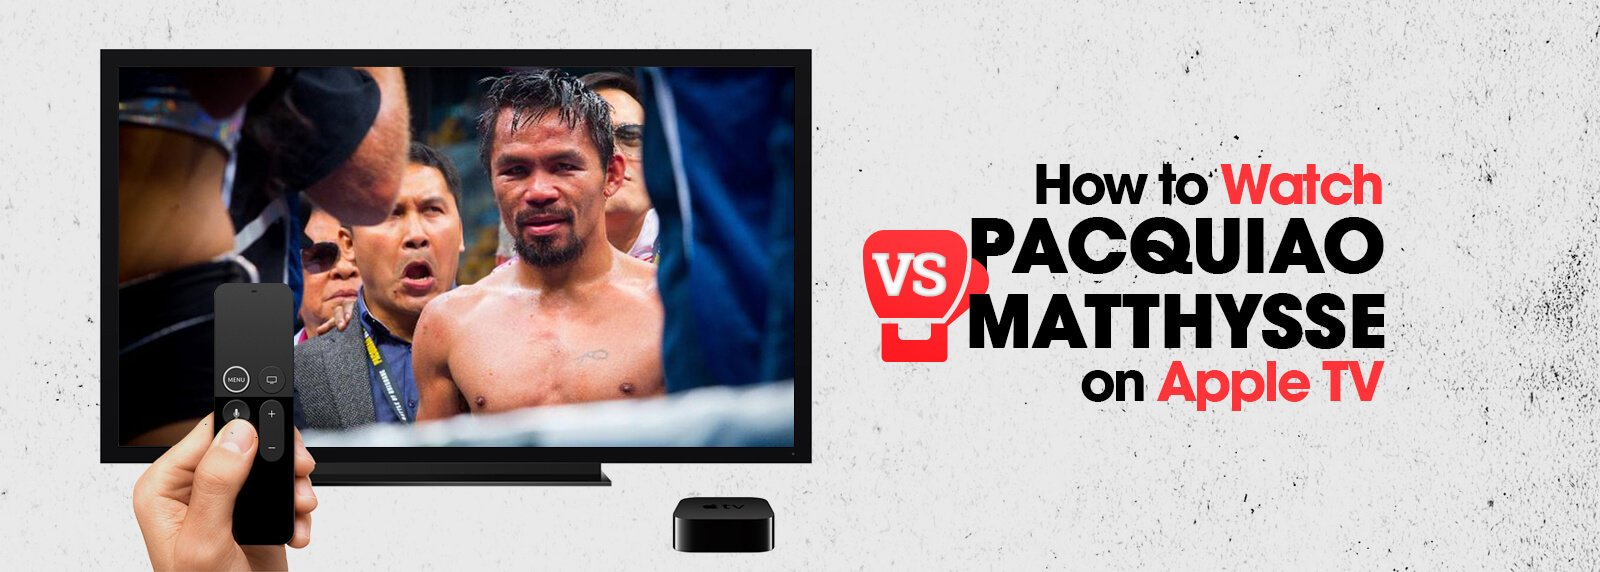 watch pacquiao vs matthysse on apple tv